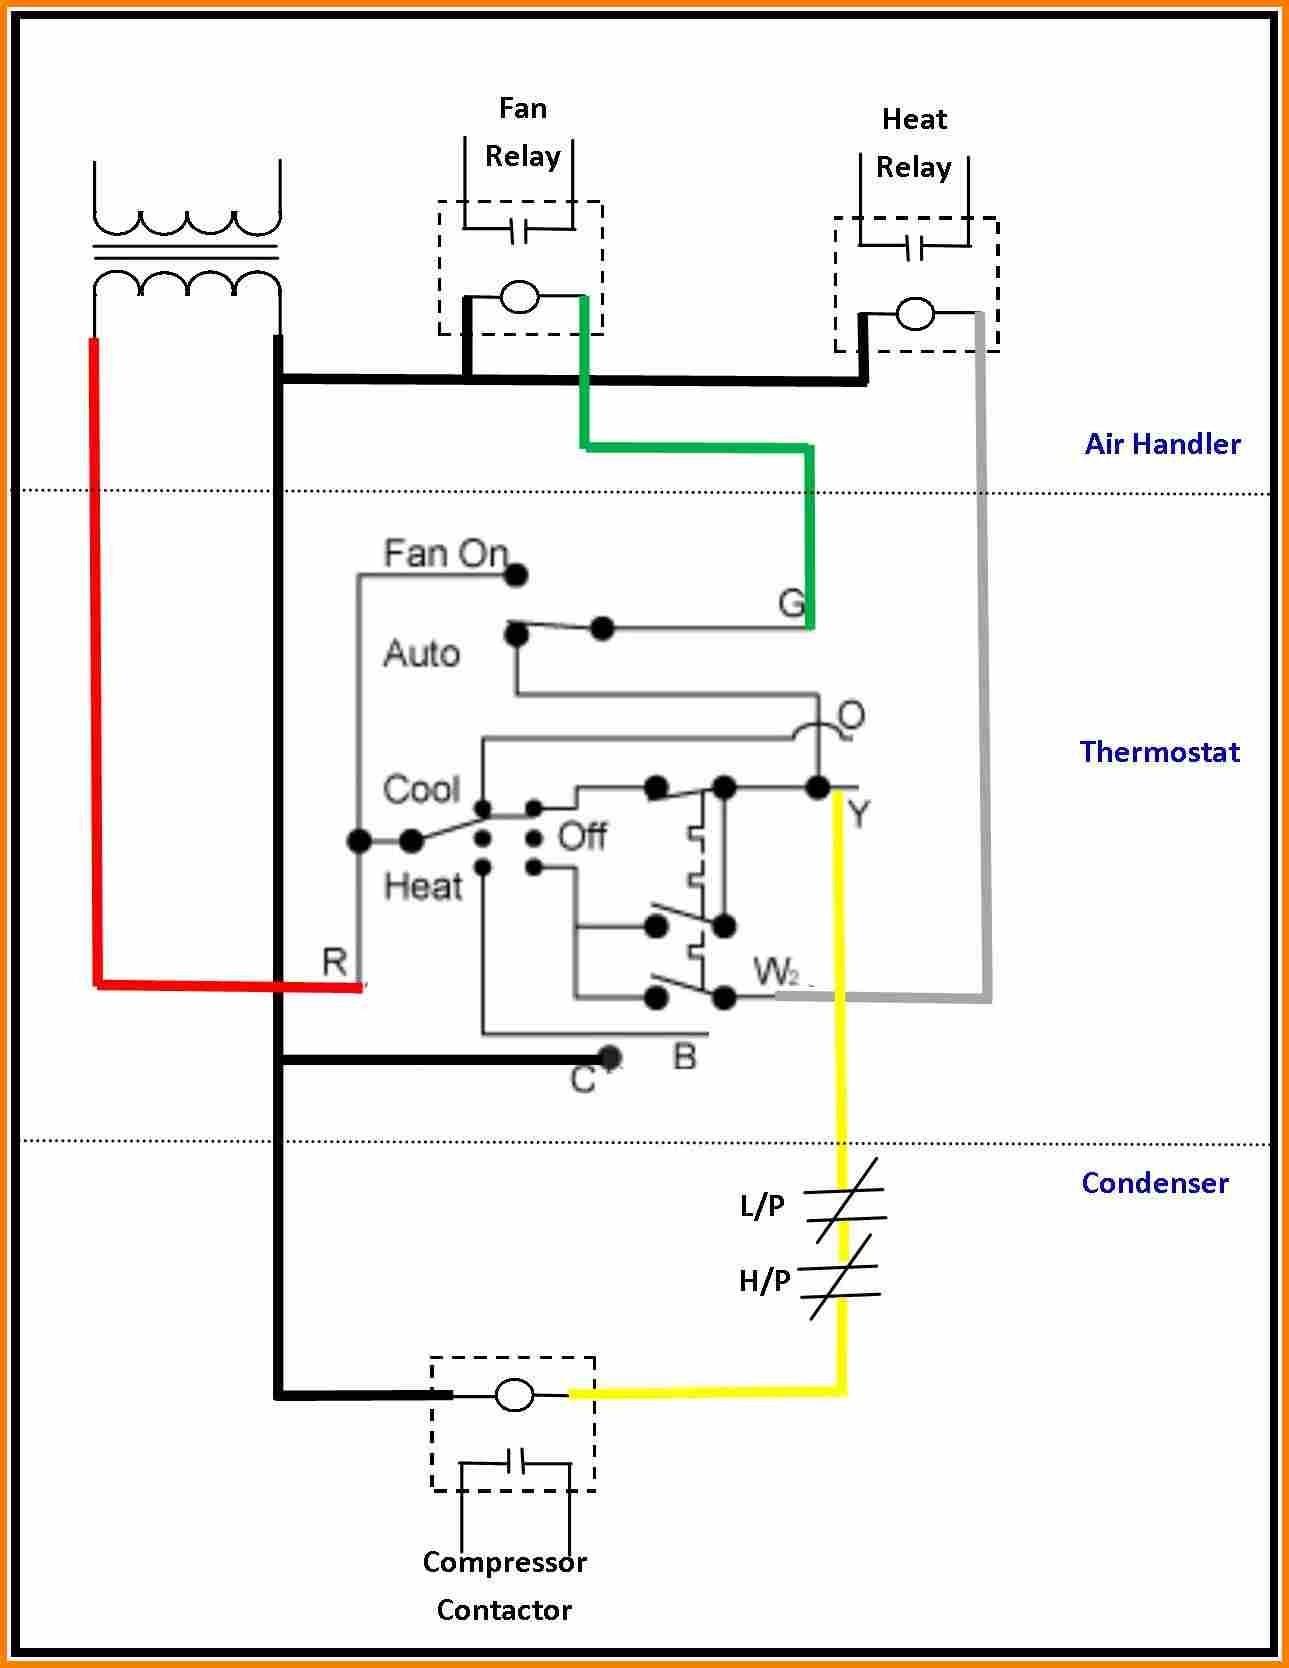 Hvac Fan Relay Wiring Diagram Ac Hvac Wiring Free Download Diagrams Schematics Best Diagram Afif